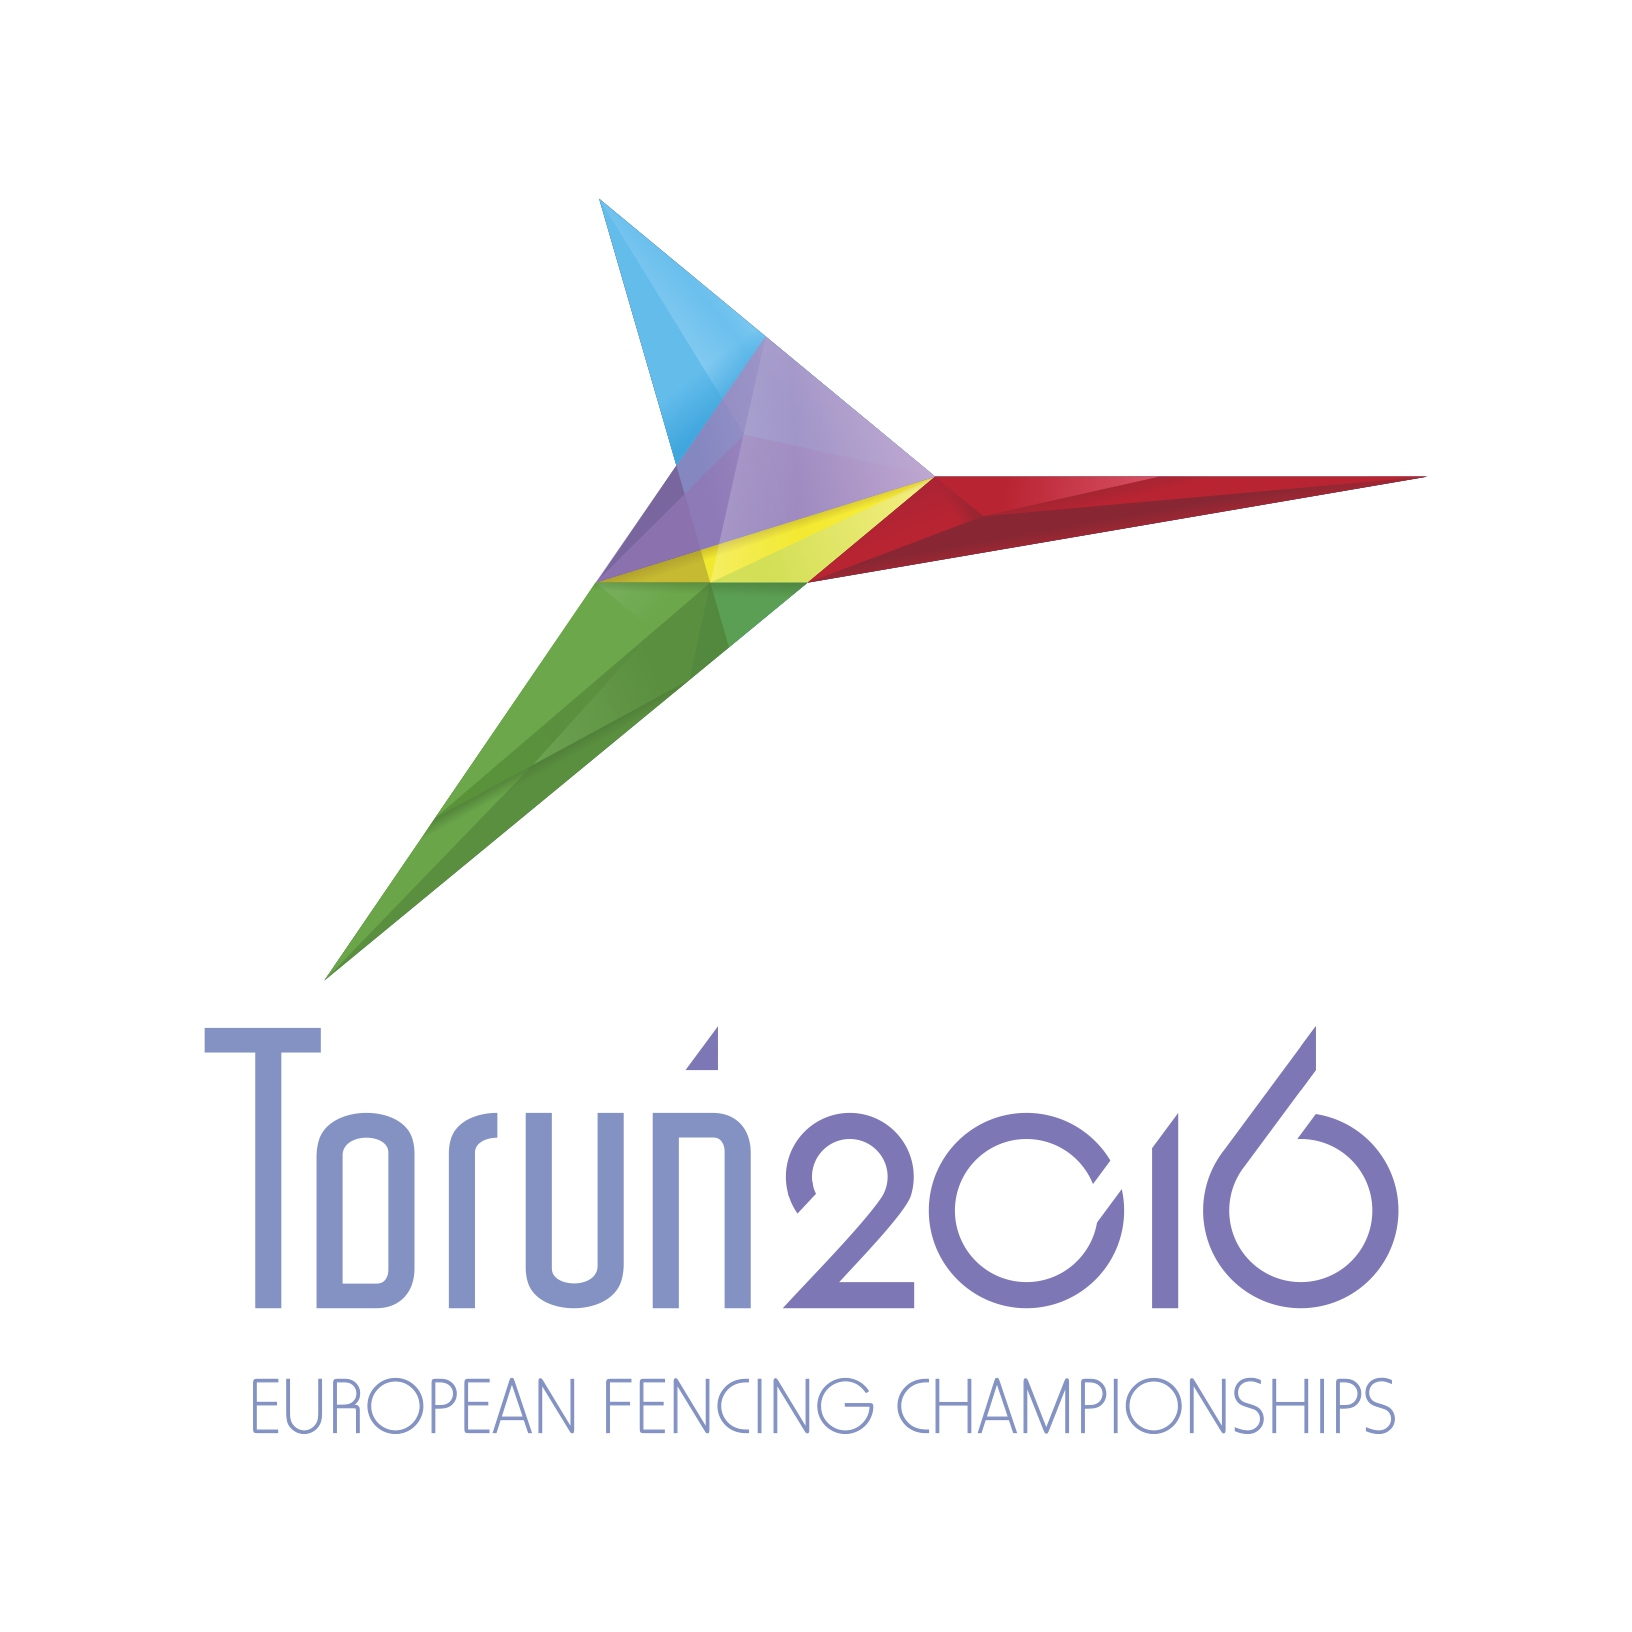 2016 European Fencing Championships